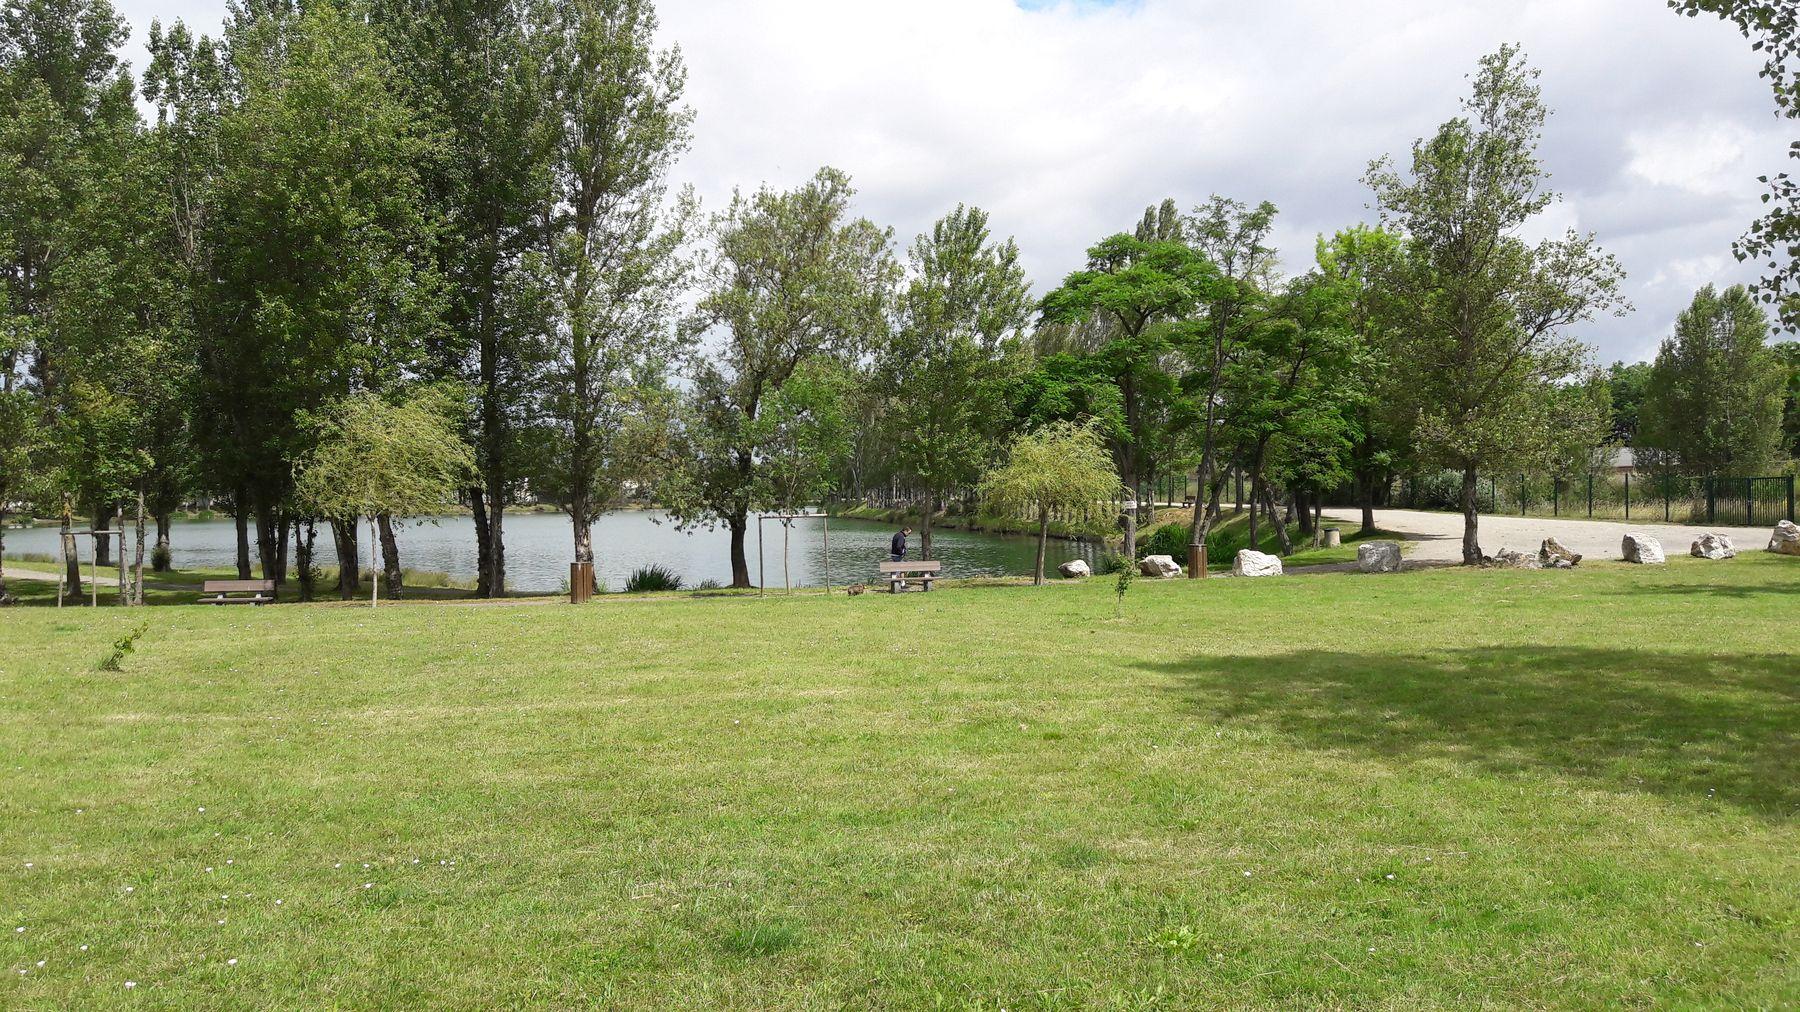 Espaces verts et espaces naturels aucamville for Centre claude robillard piscine horaire